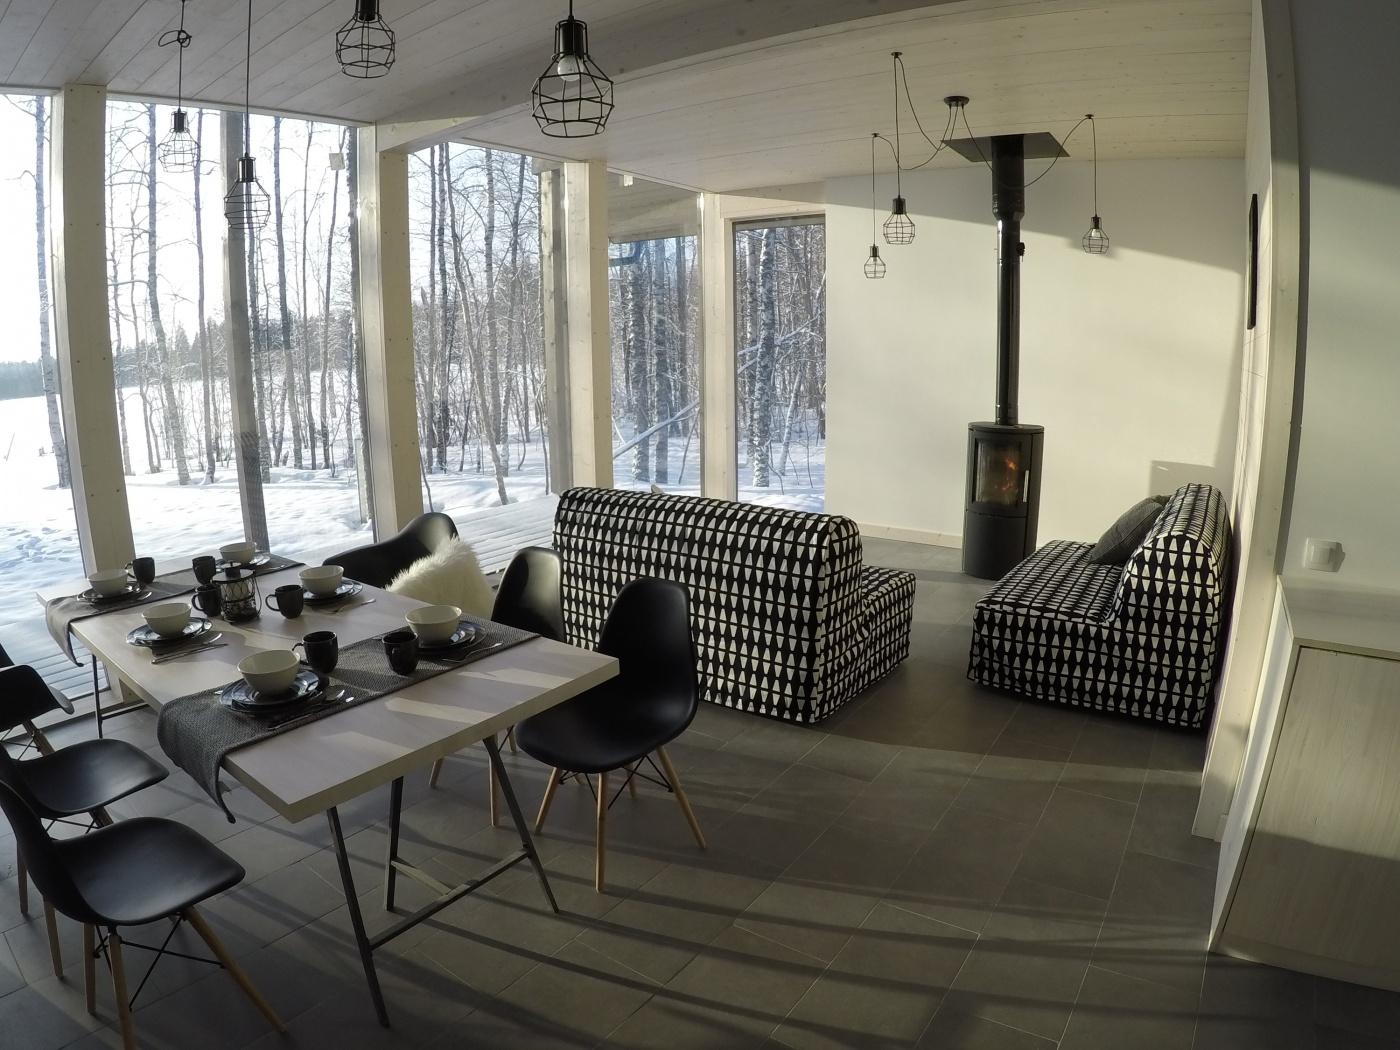 Коттеджный комплекс «Ахвенлампи» Республика Карелия Лофт-хаус «Матриярви», фото 5